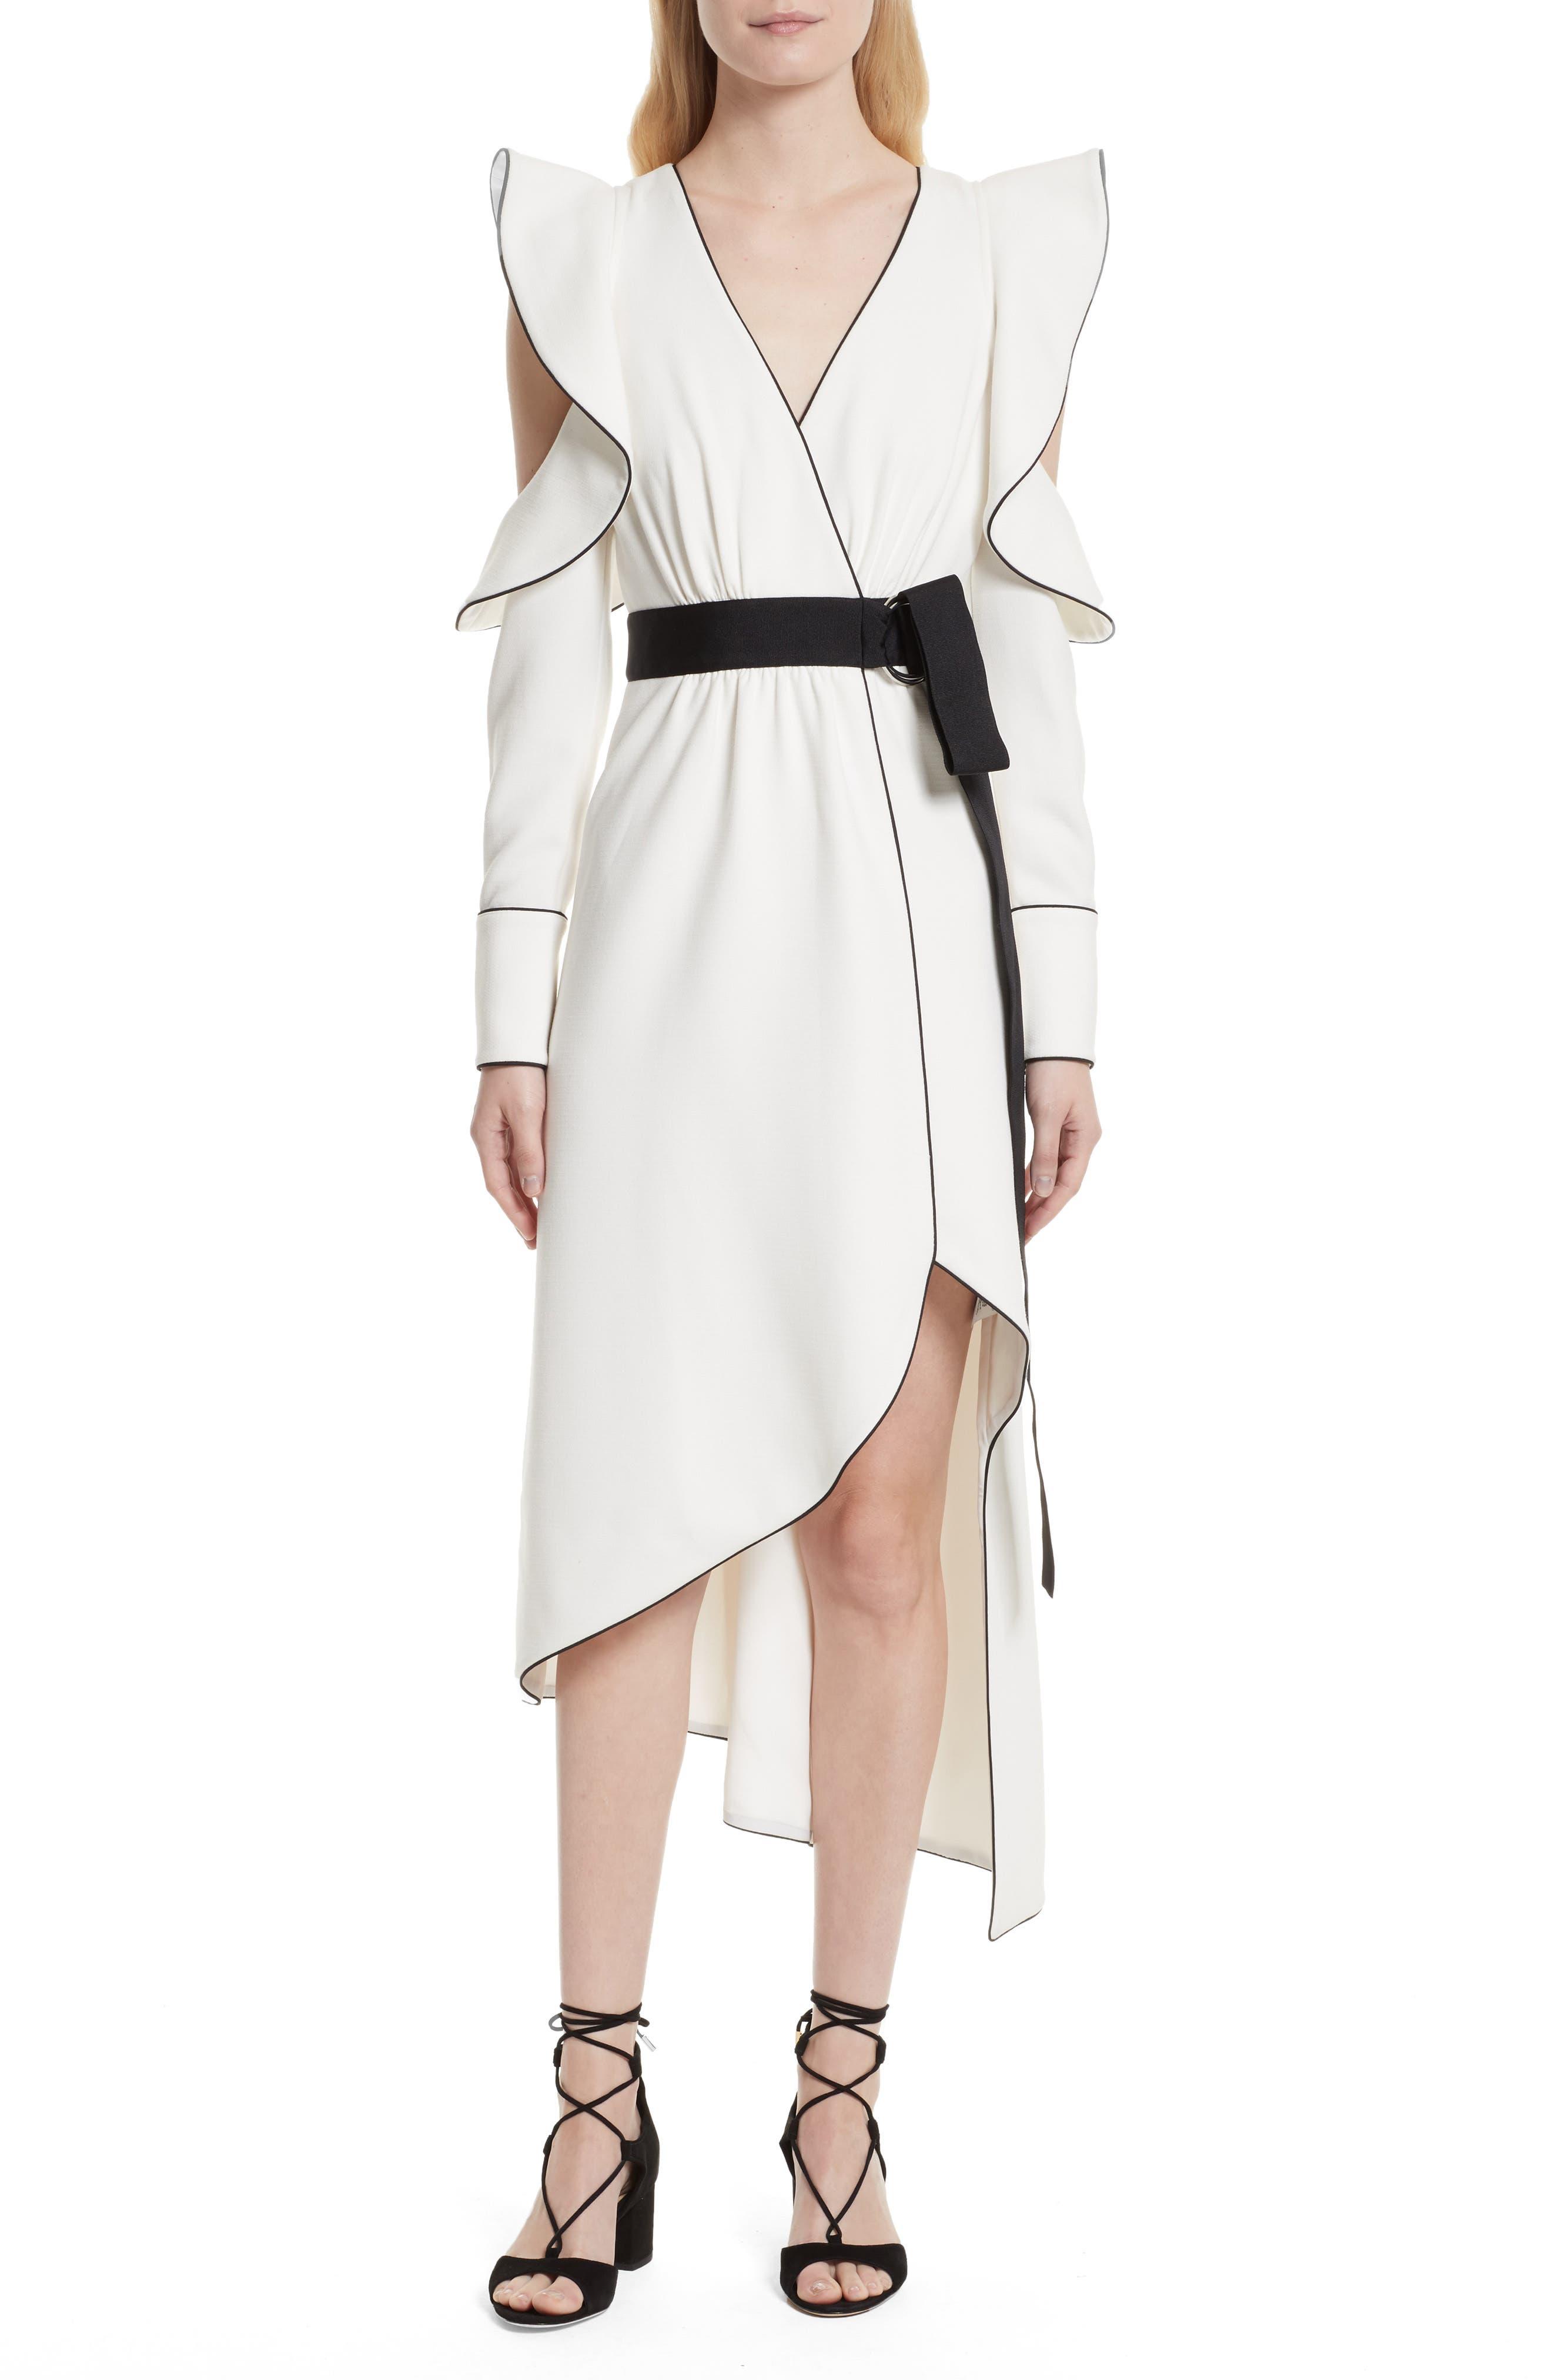 Alternate Image 1 Selected - Self-Portrait Cold Shoulder Asymmetrical Dress